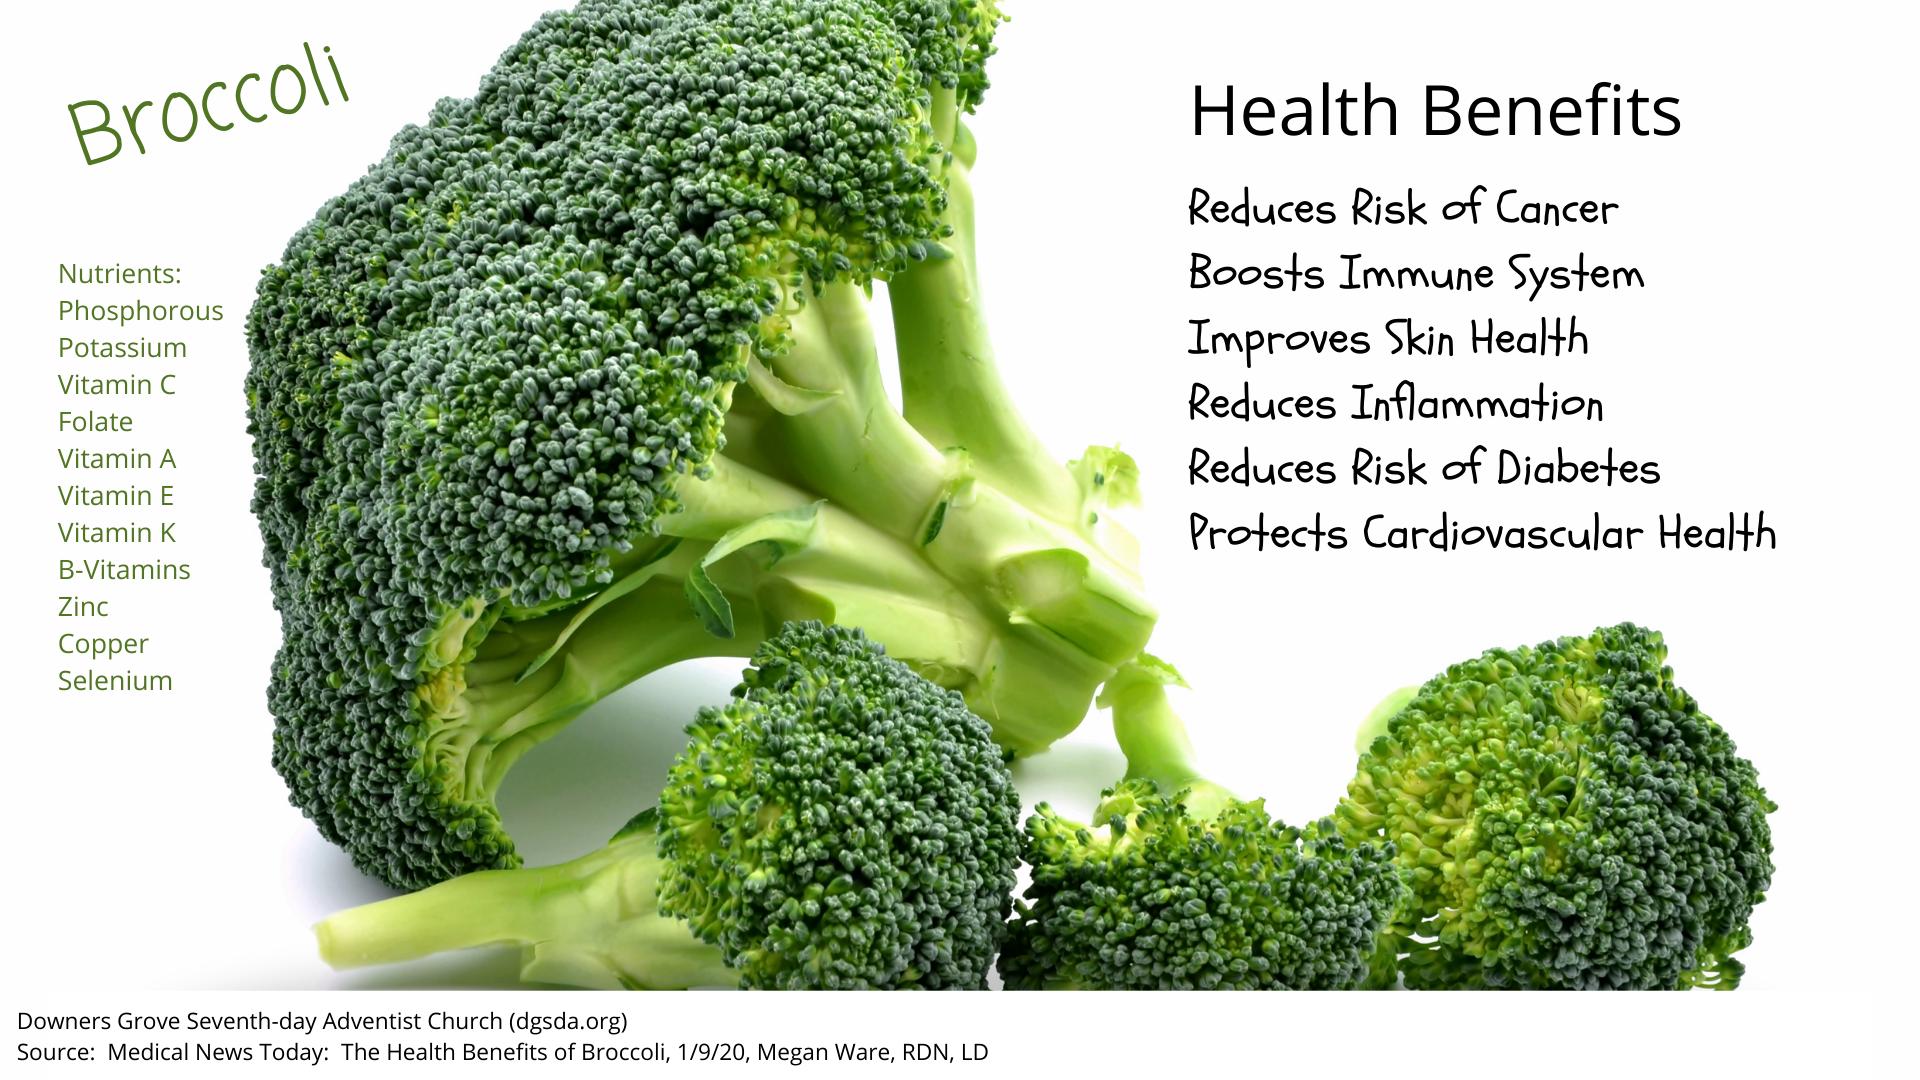 Health Benefits of Brocoli